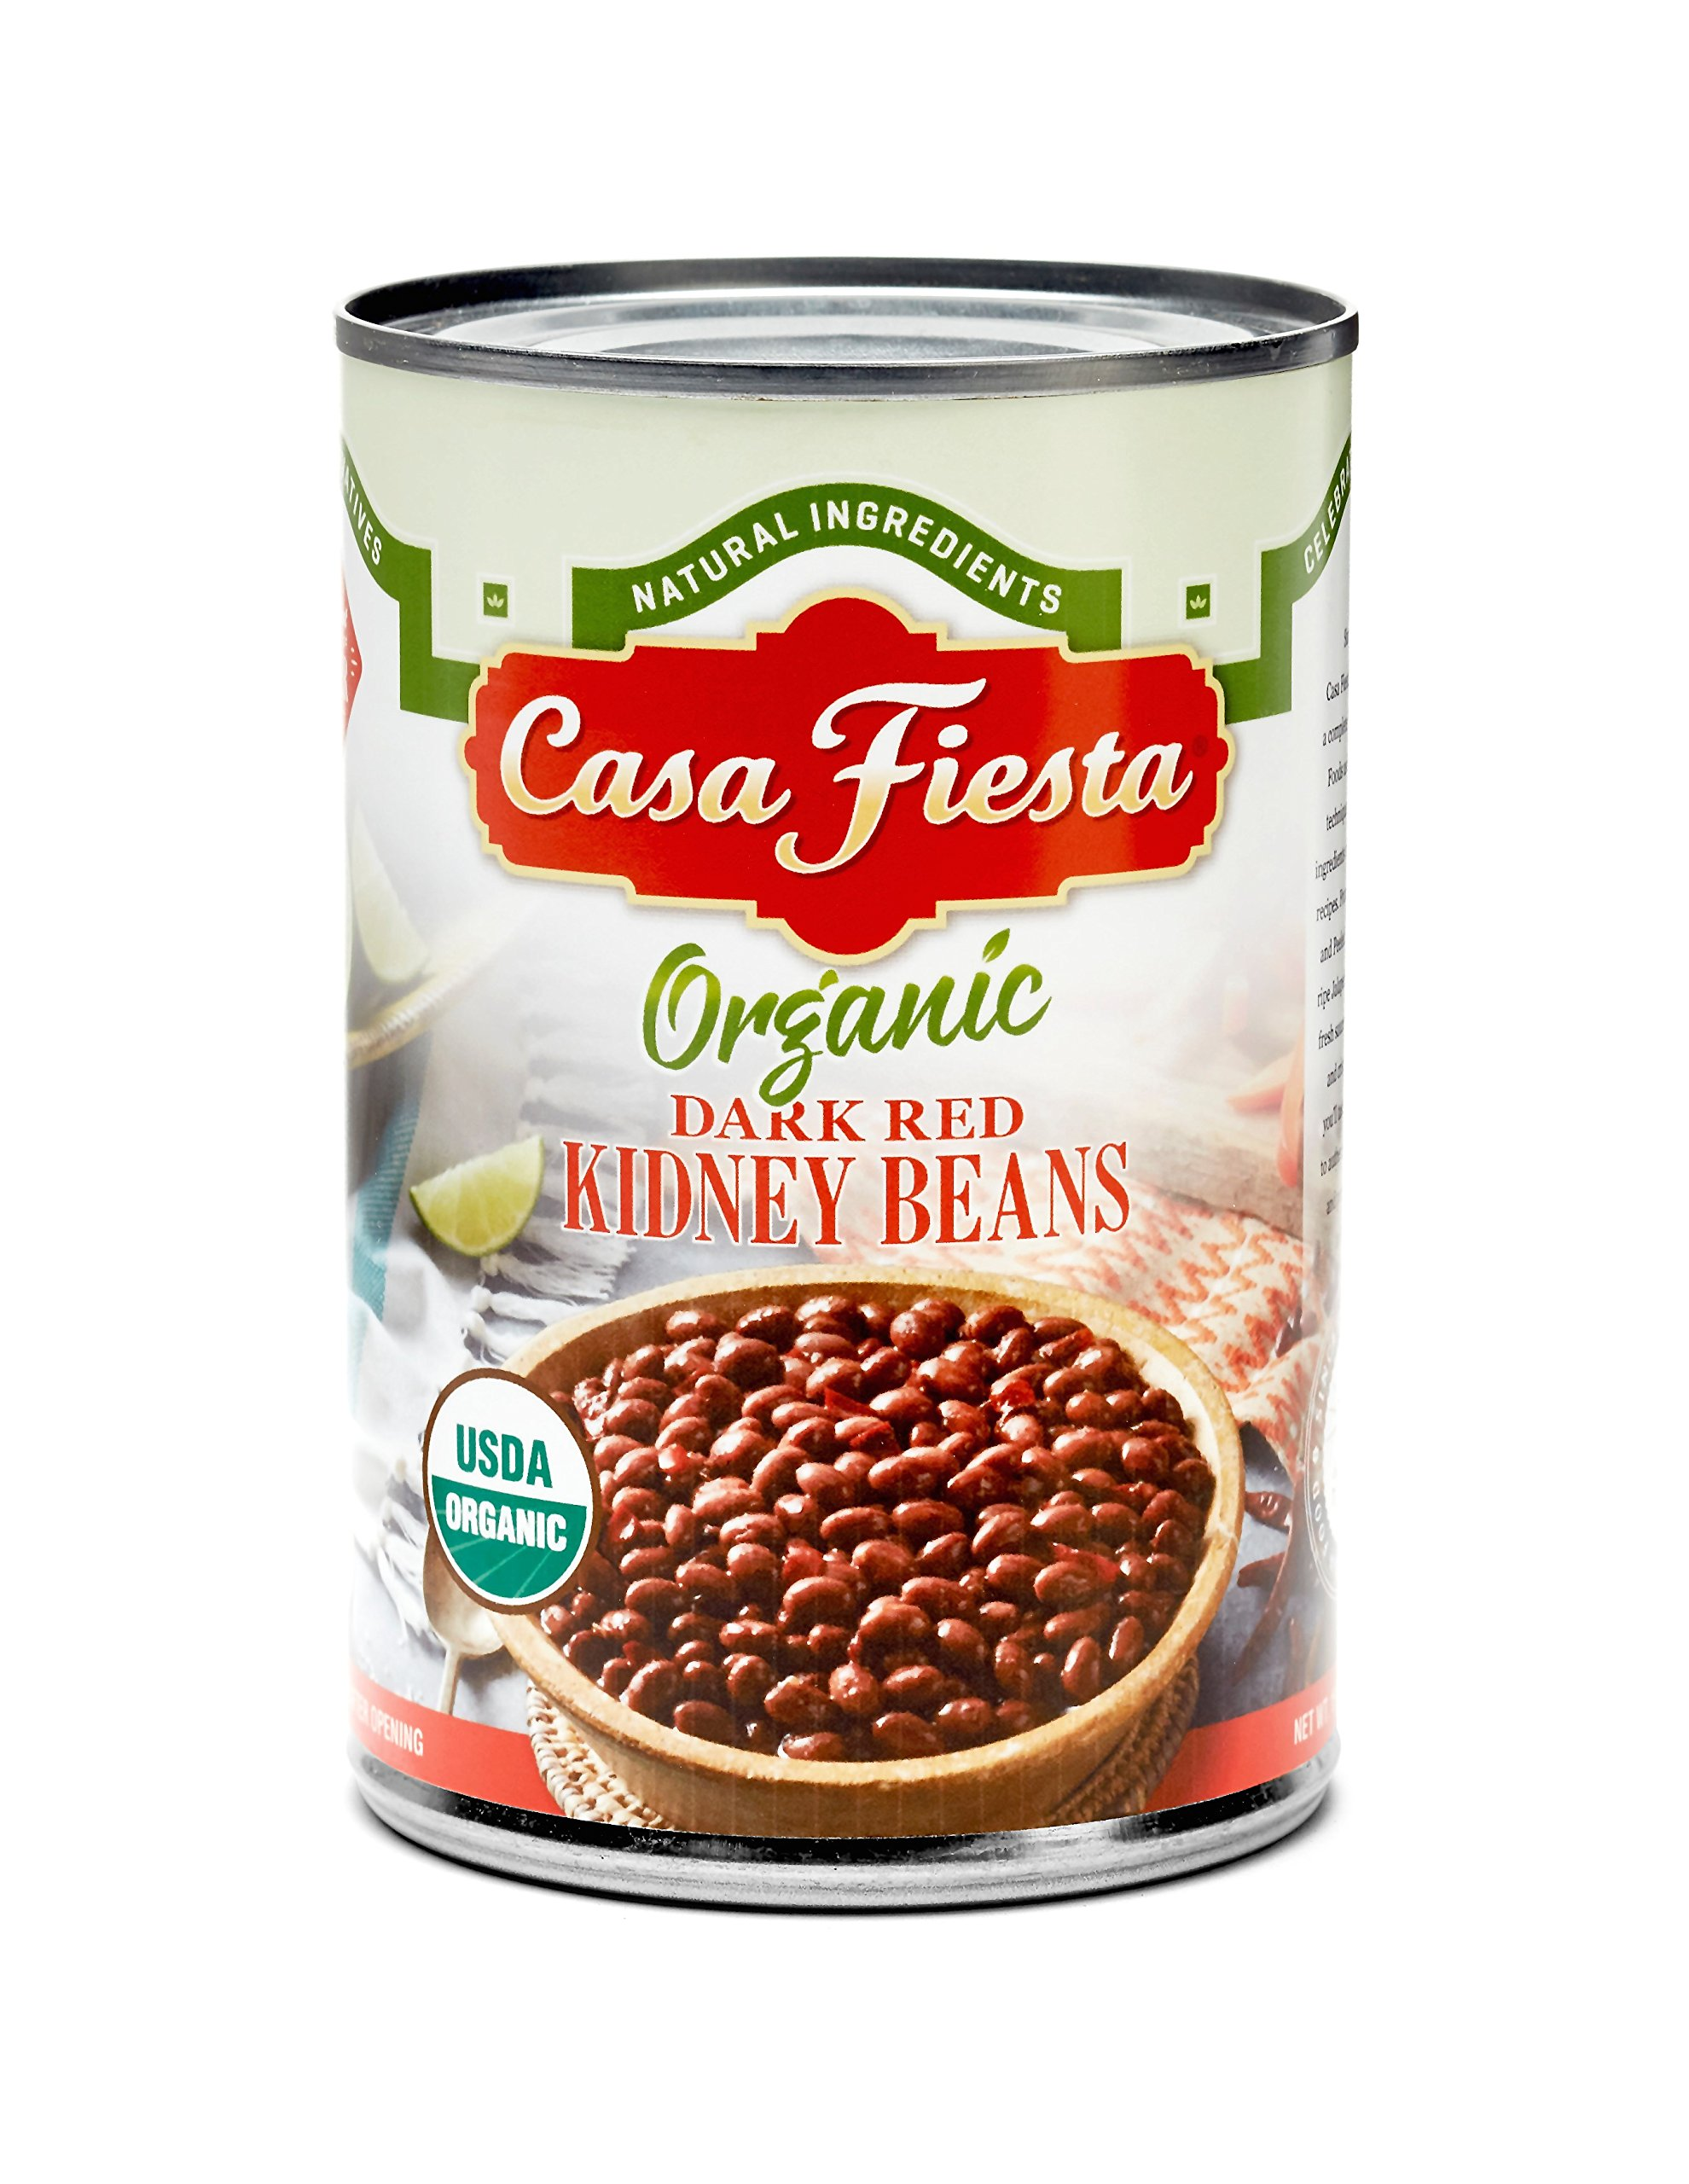 Casa Fiesta Organic Dark Red Kidney Beans 15oz 12 pack by Casa Fiesta